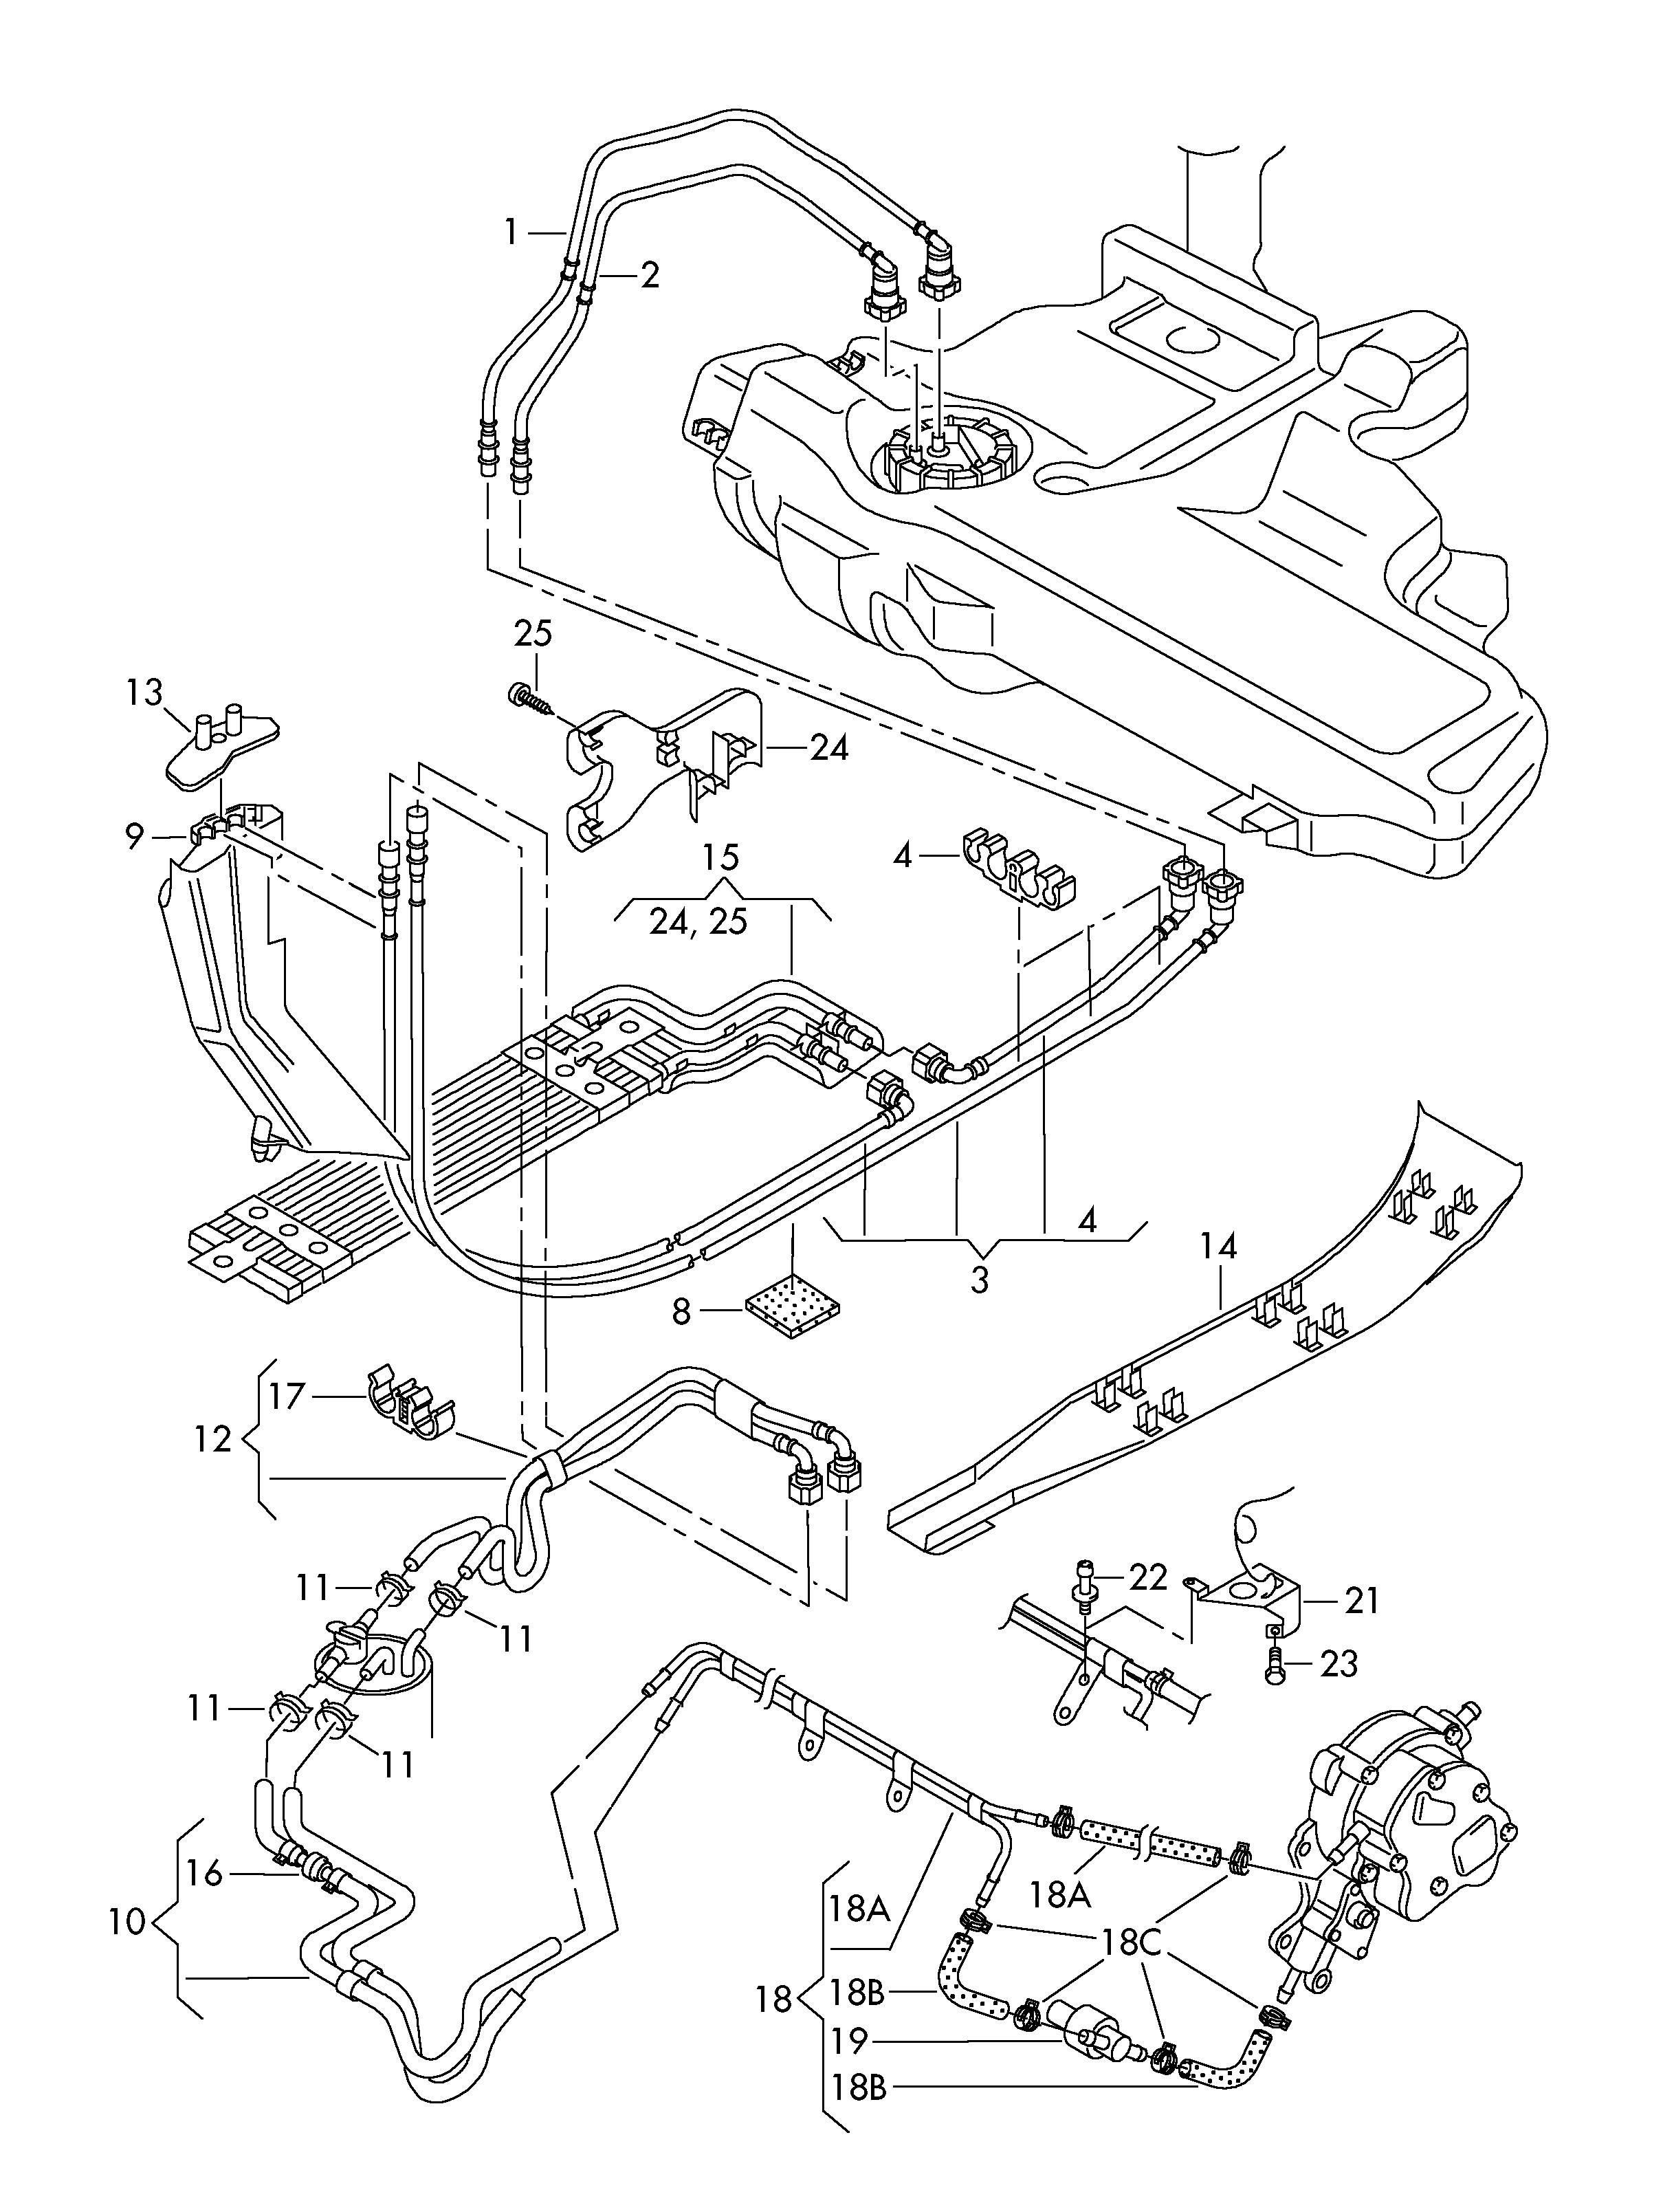 volkswagen jetta (2003 - 2006) / vag etka